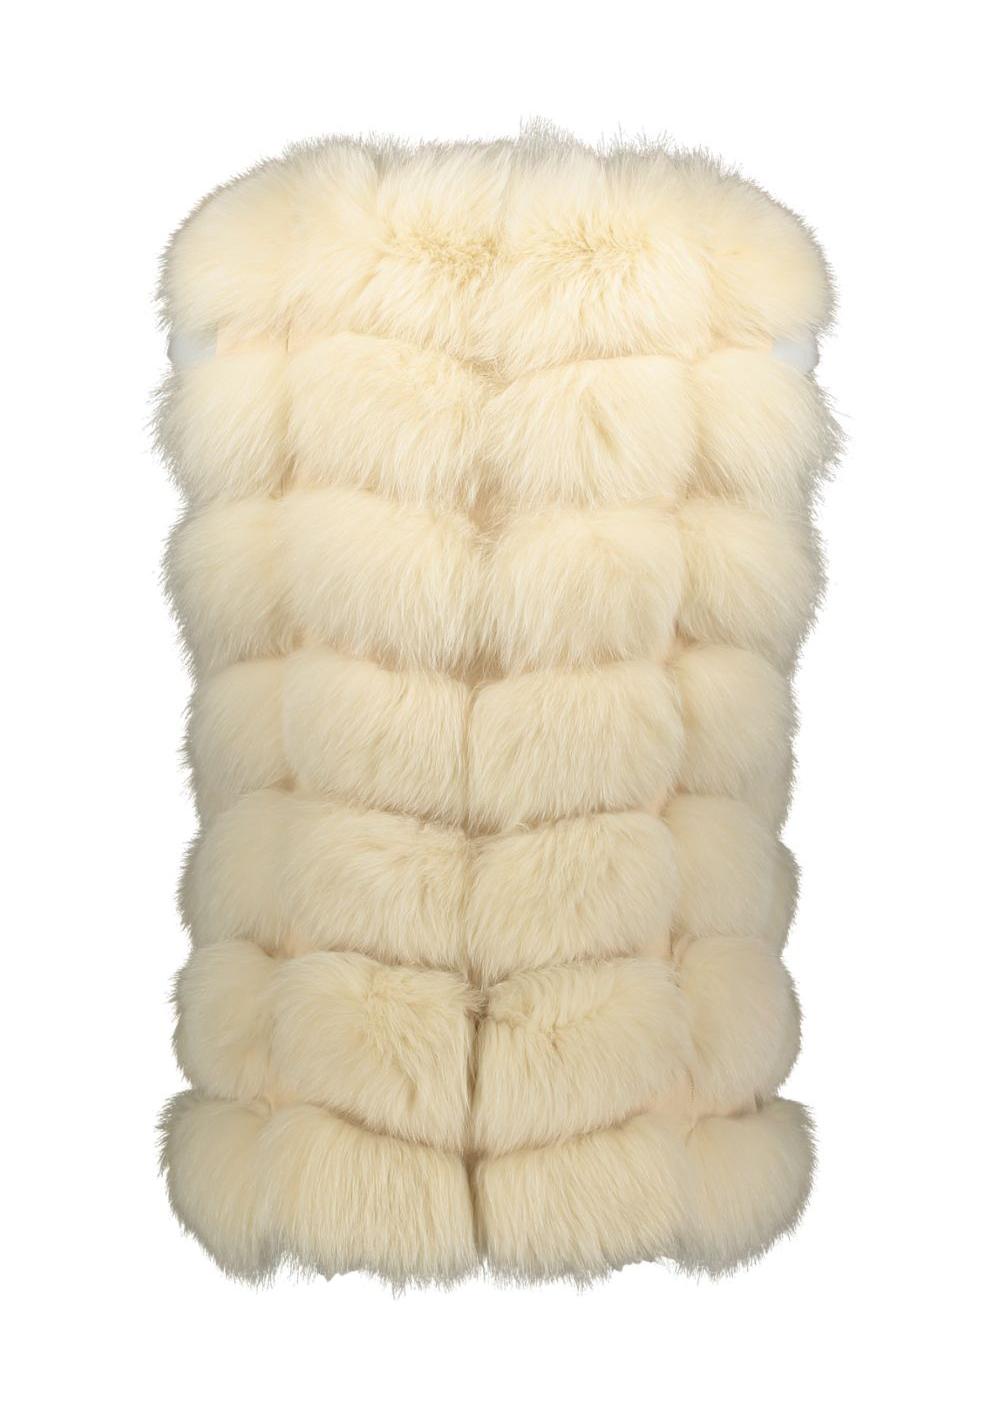 Paris fox Vest back _Front_JPG-Fixed1200x1000